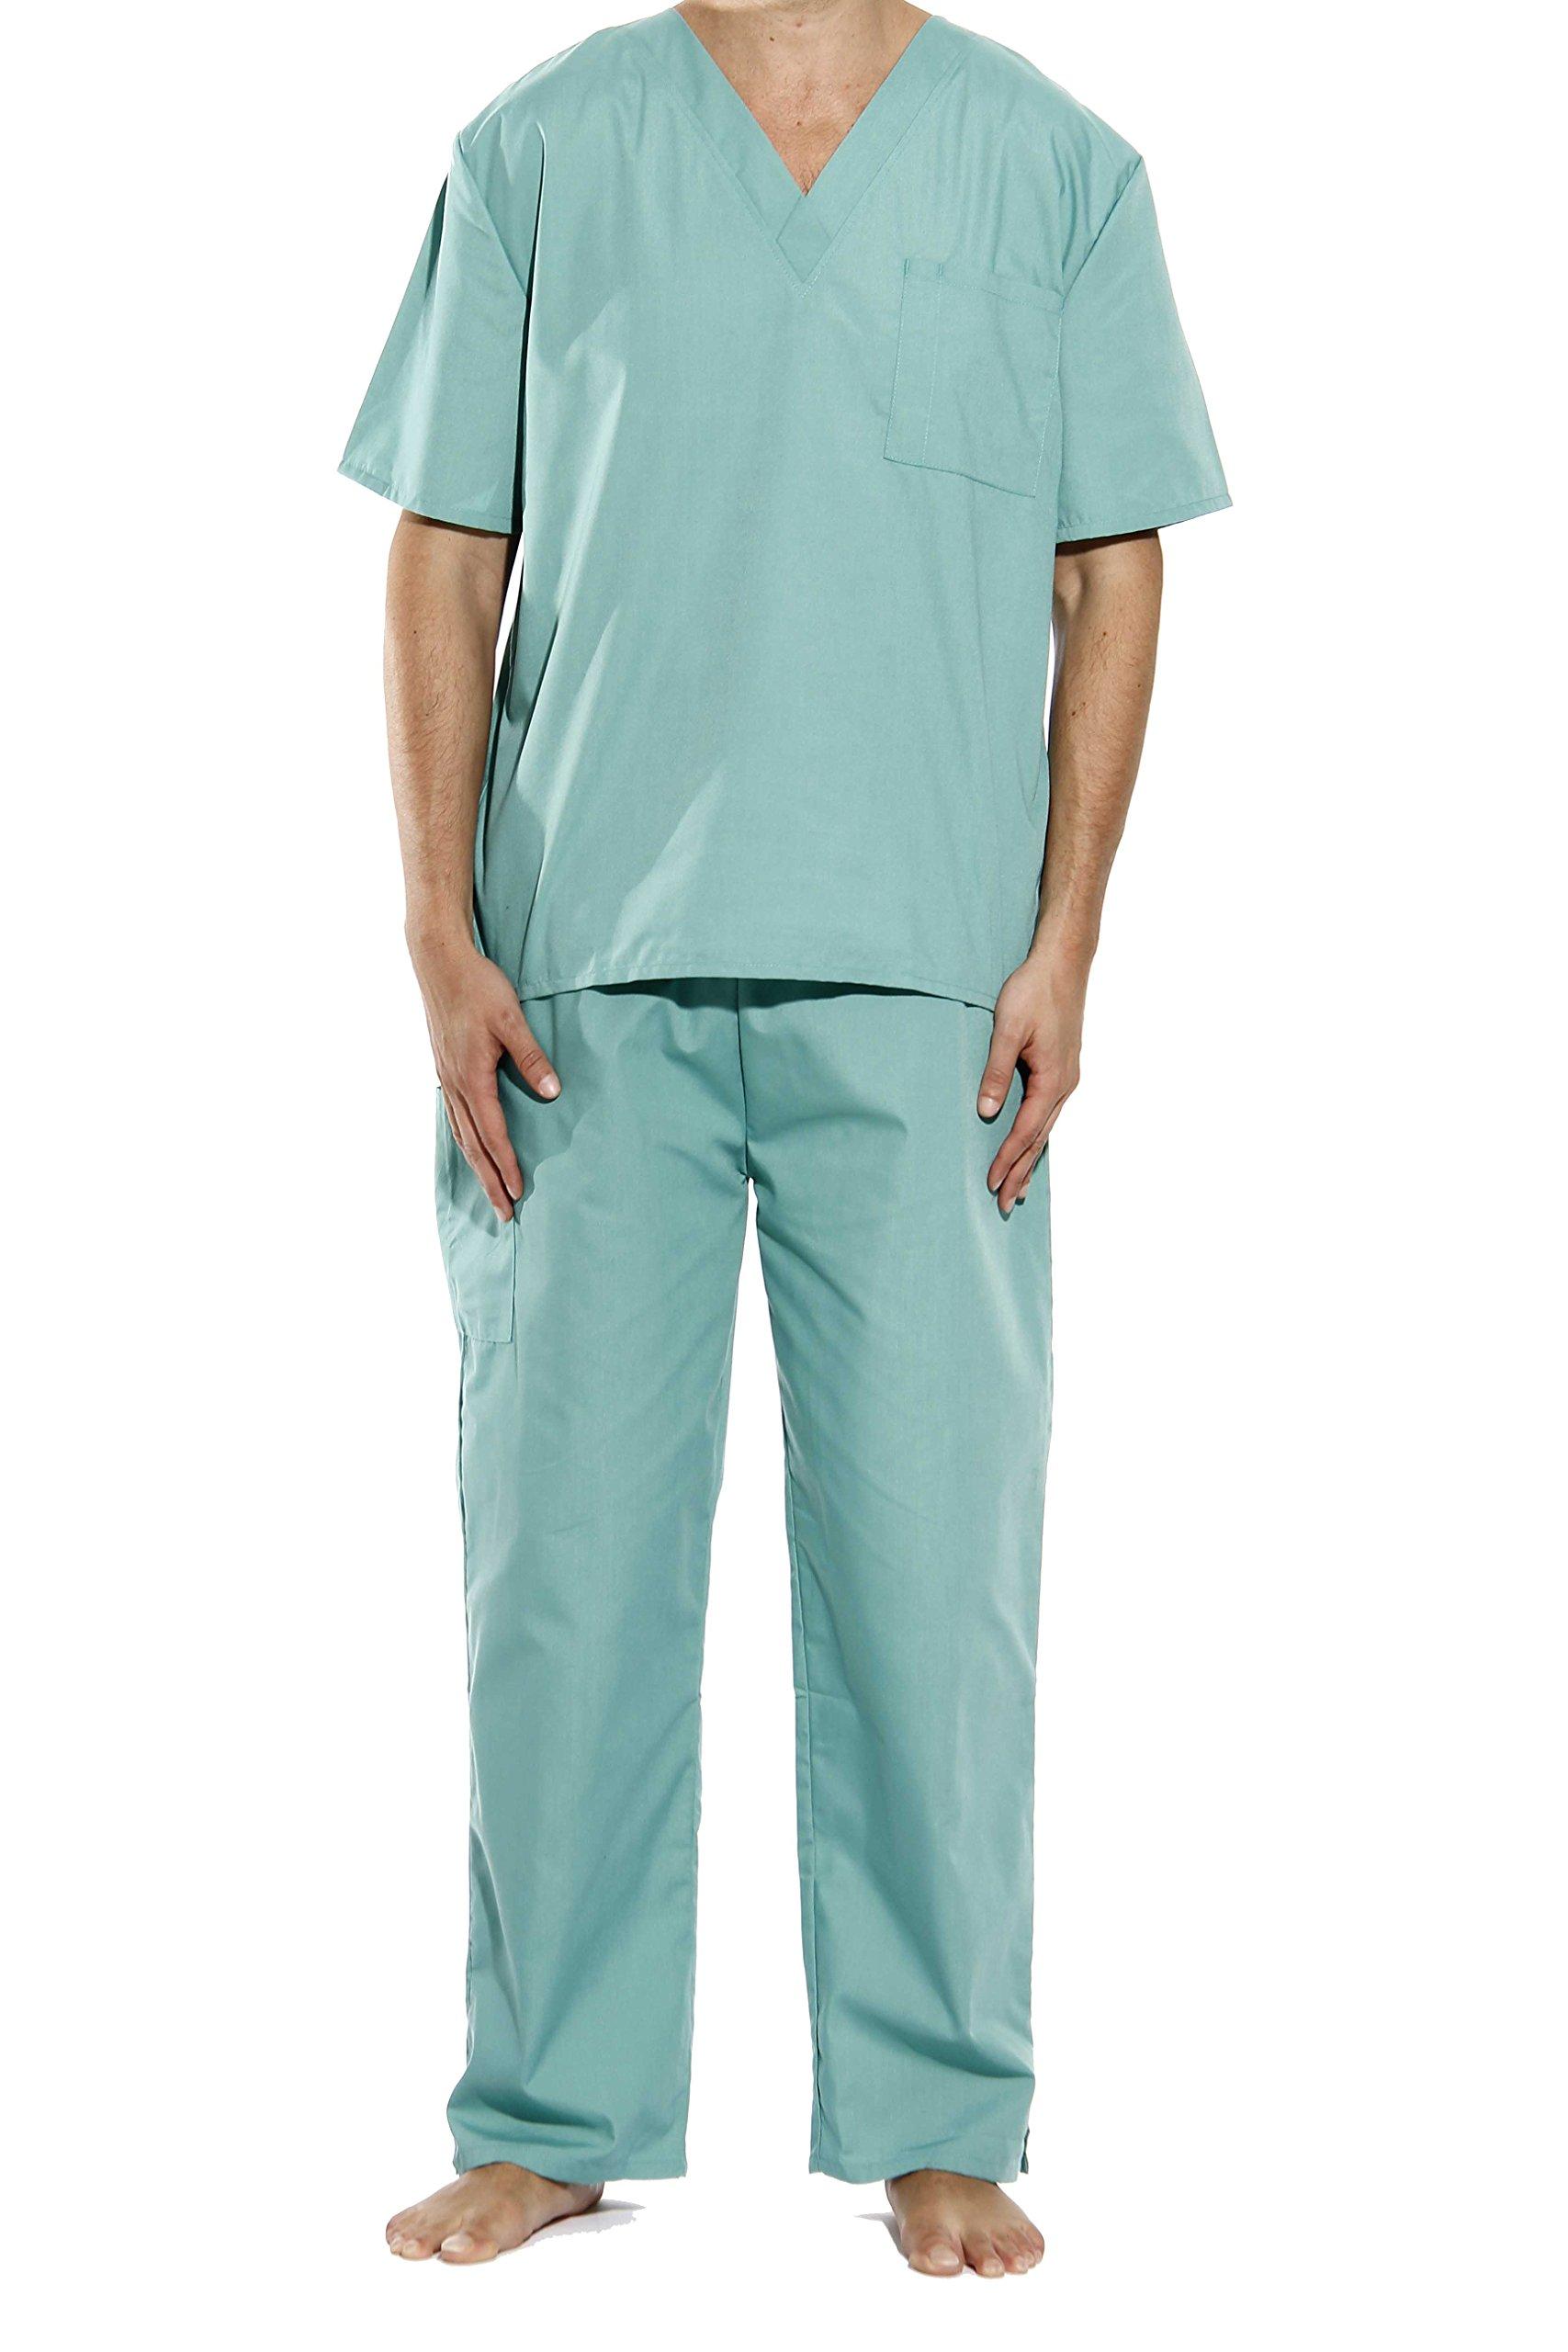 33000M-Teal-XL Tropi Unisex Scrub Sets / Medical Scrubs / Nursing Scrubs